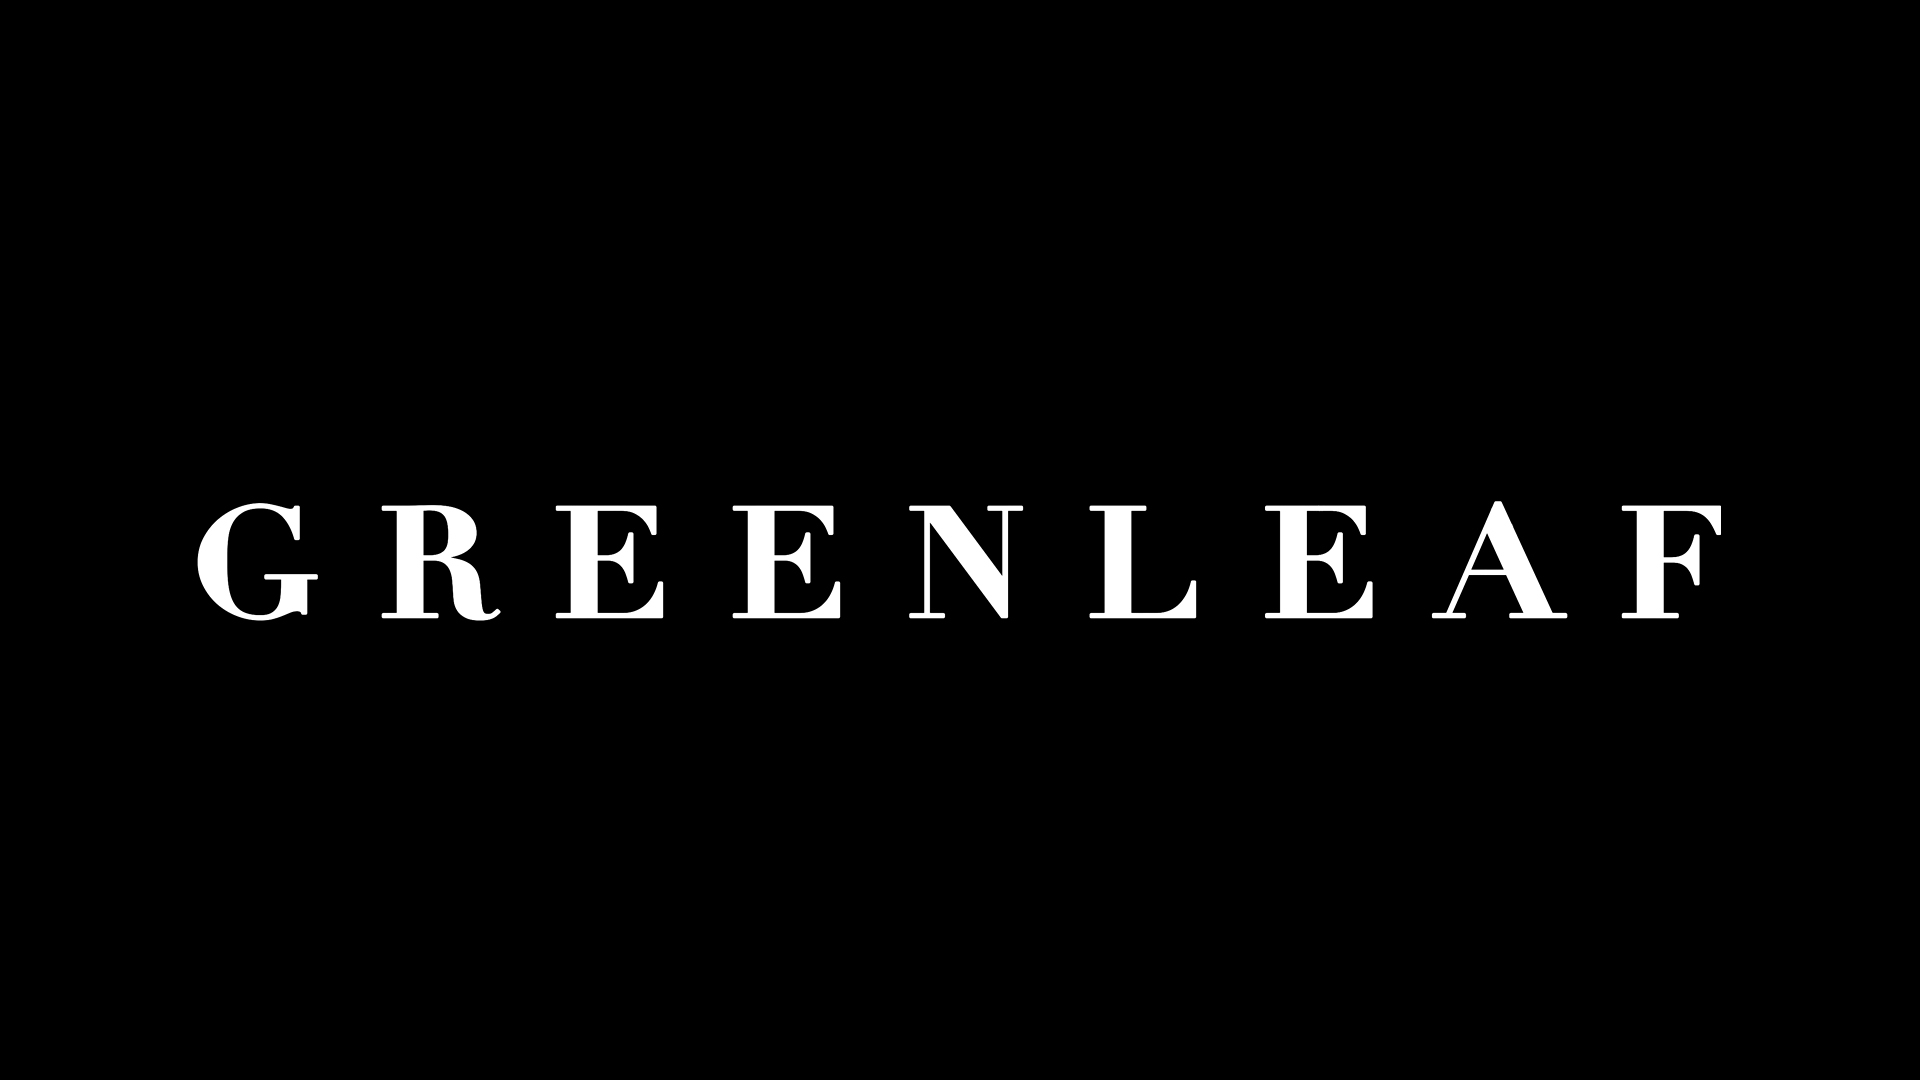 Greenleaf 1x12 - Veni, Vidi, Vici